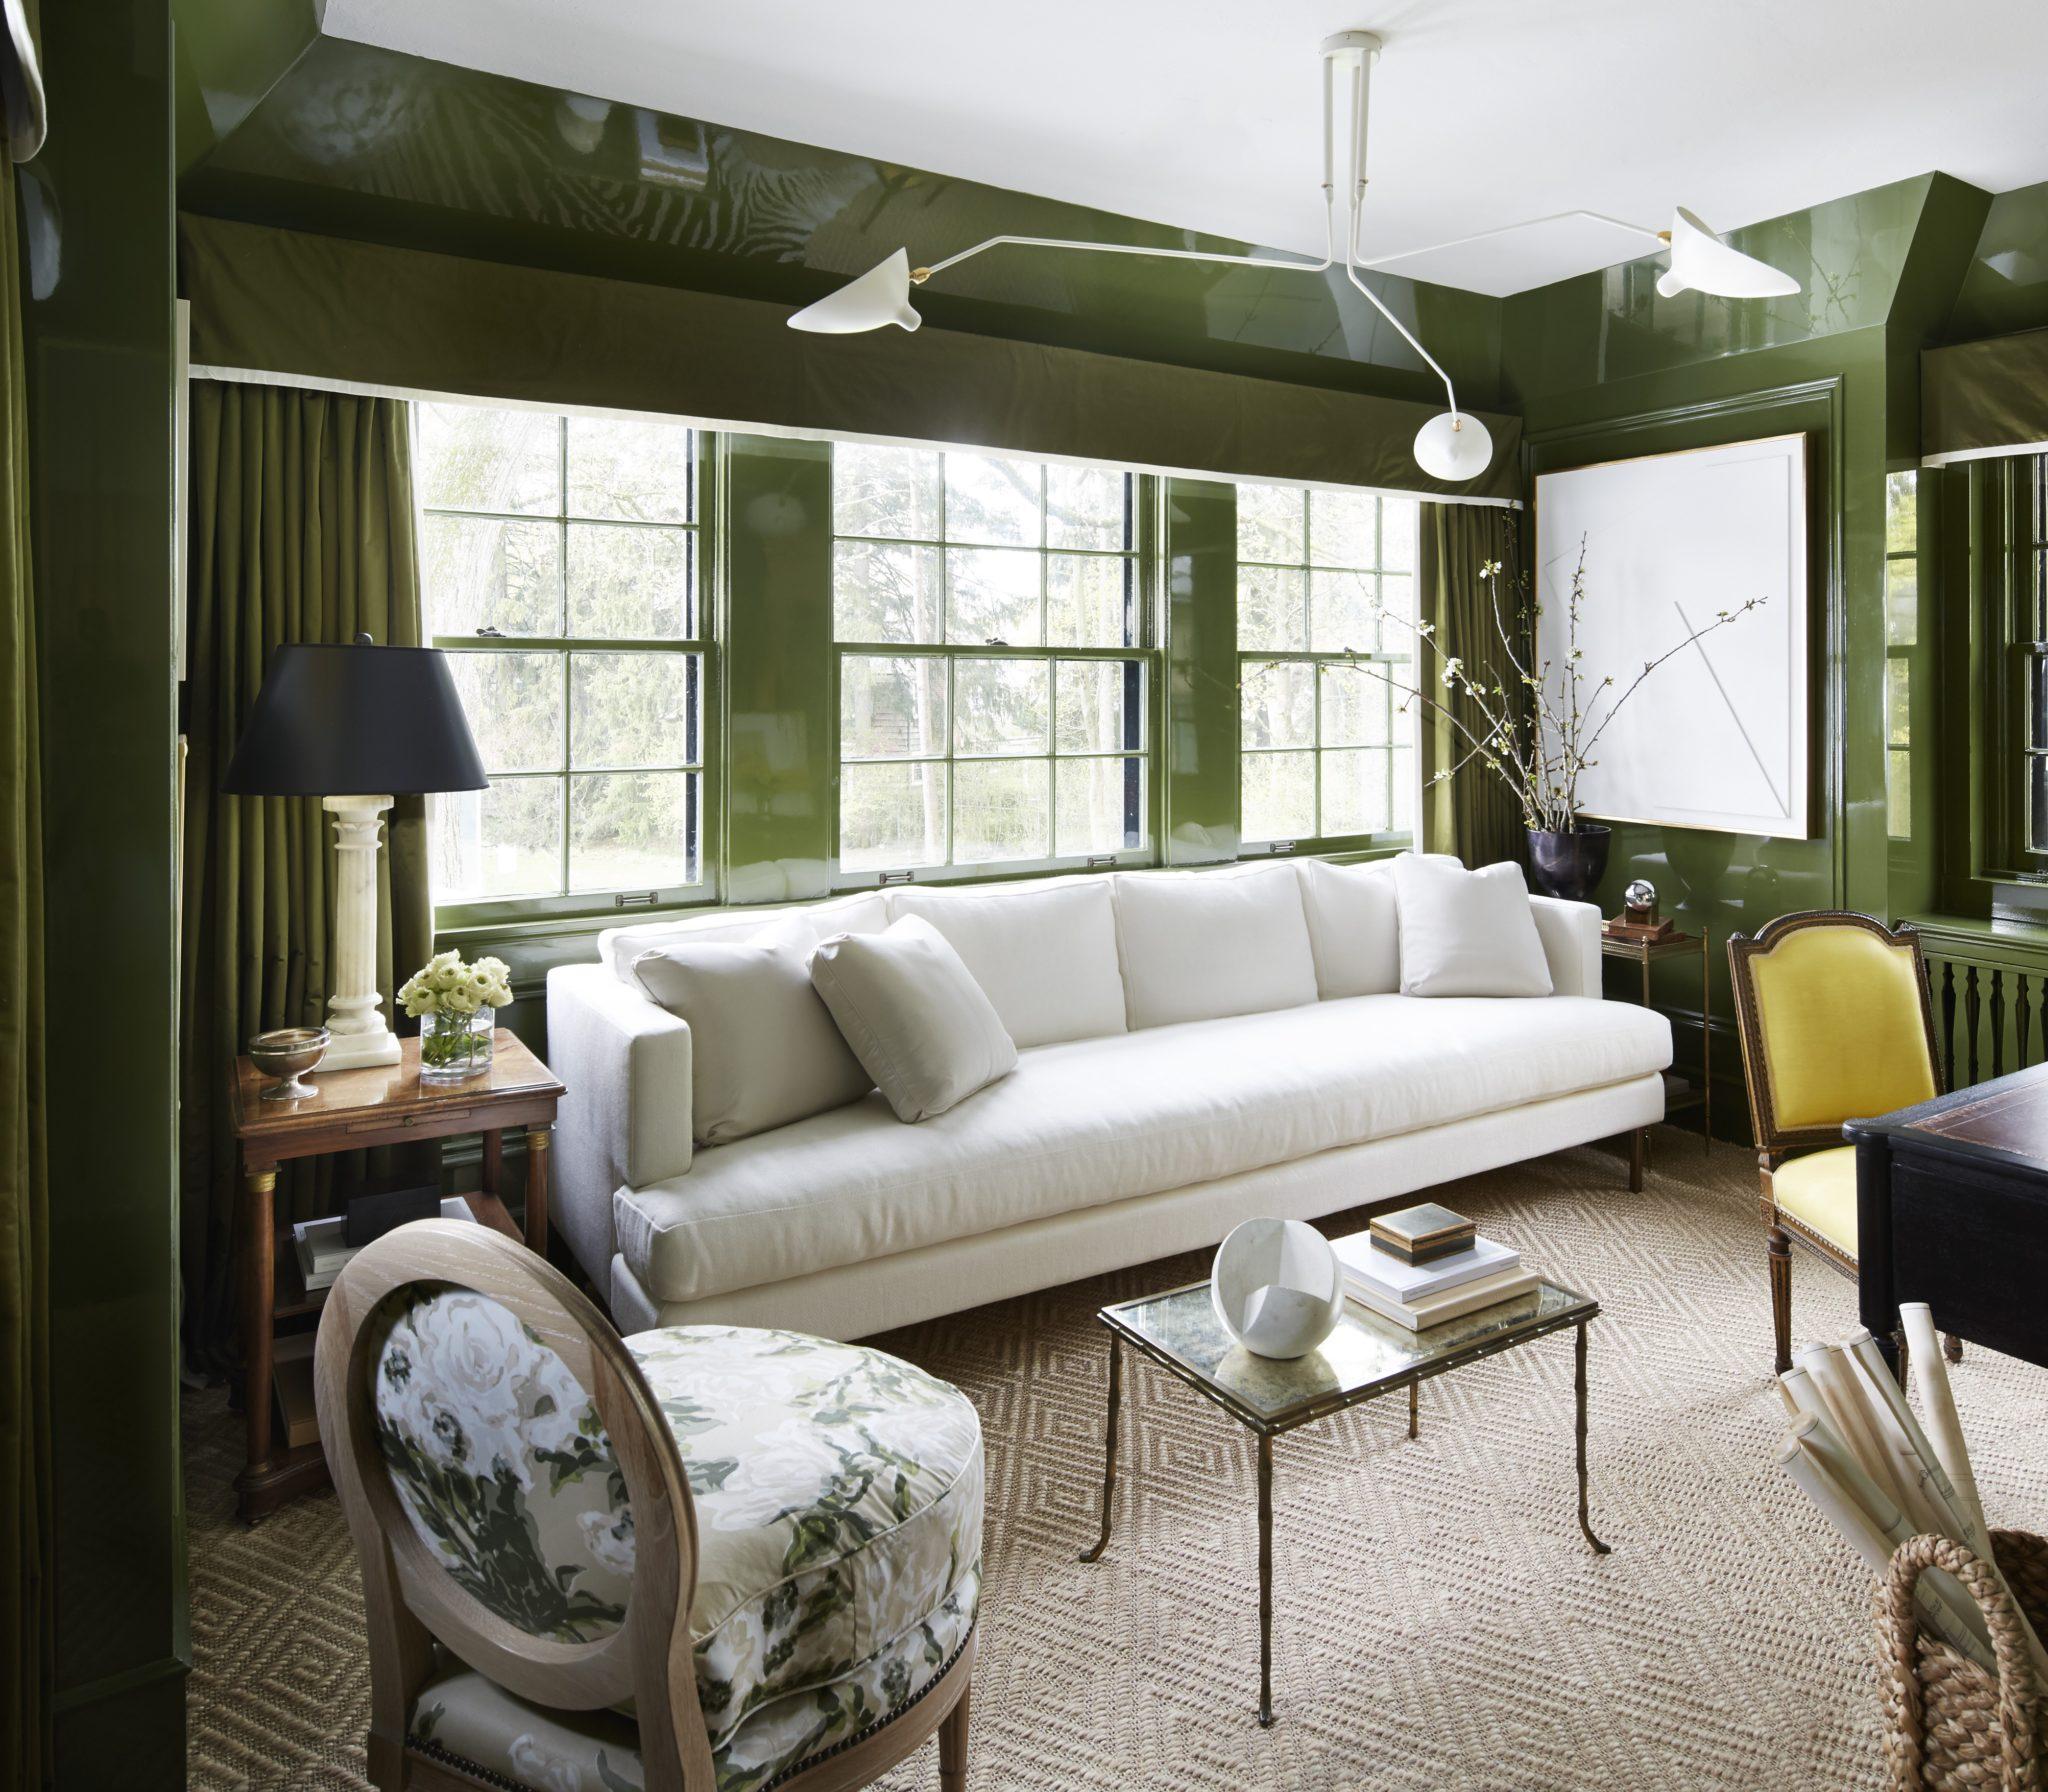 Girls' sitting room by Wendy Labrum Interiors